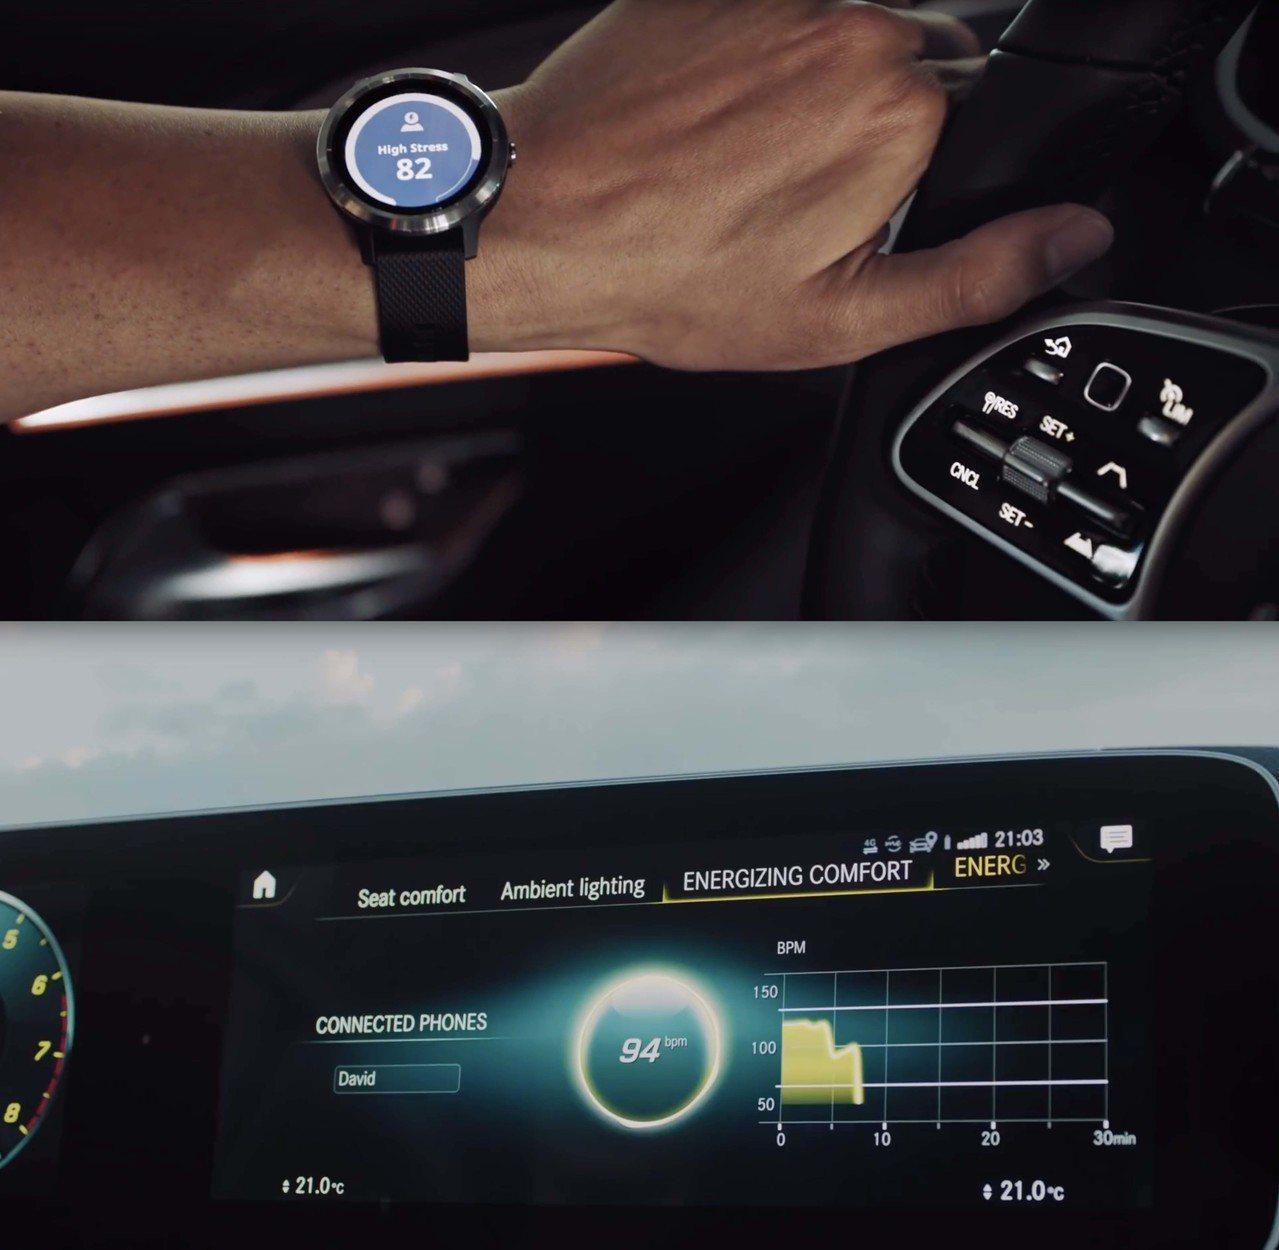 Garmin攜手Mercedes Benz推限定版智慧腕表。圖/Garmin提供